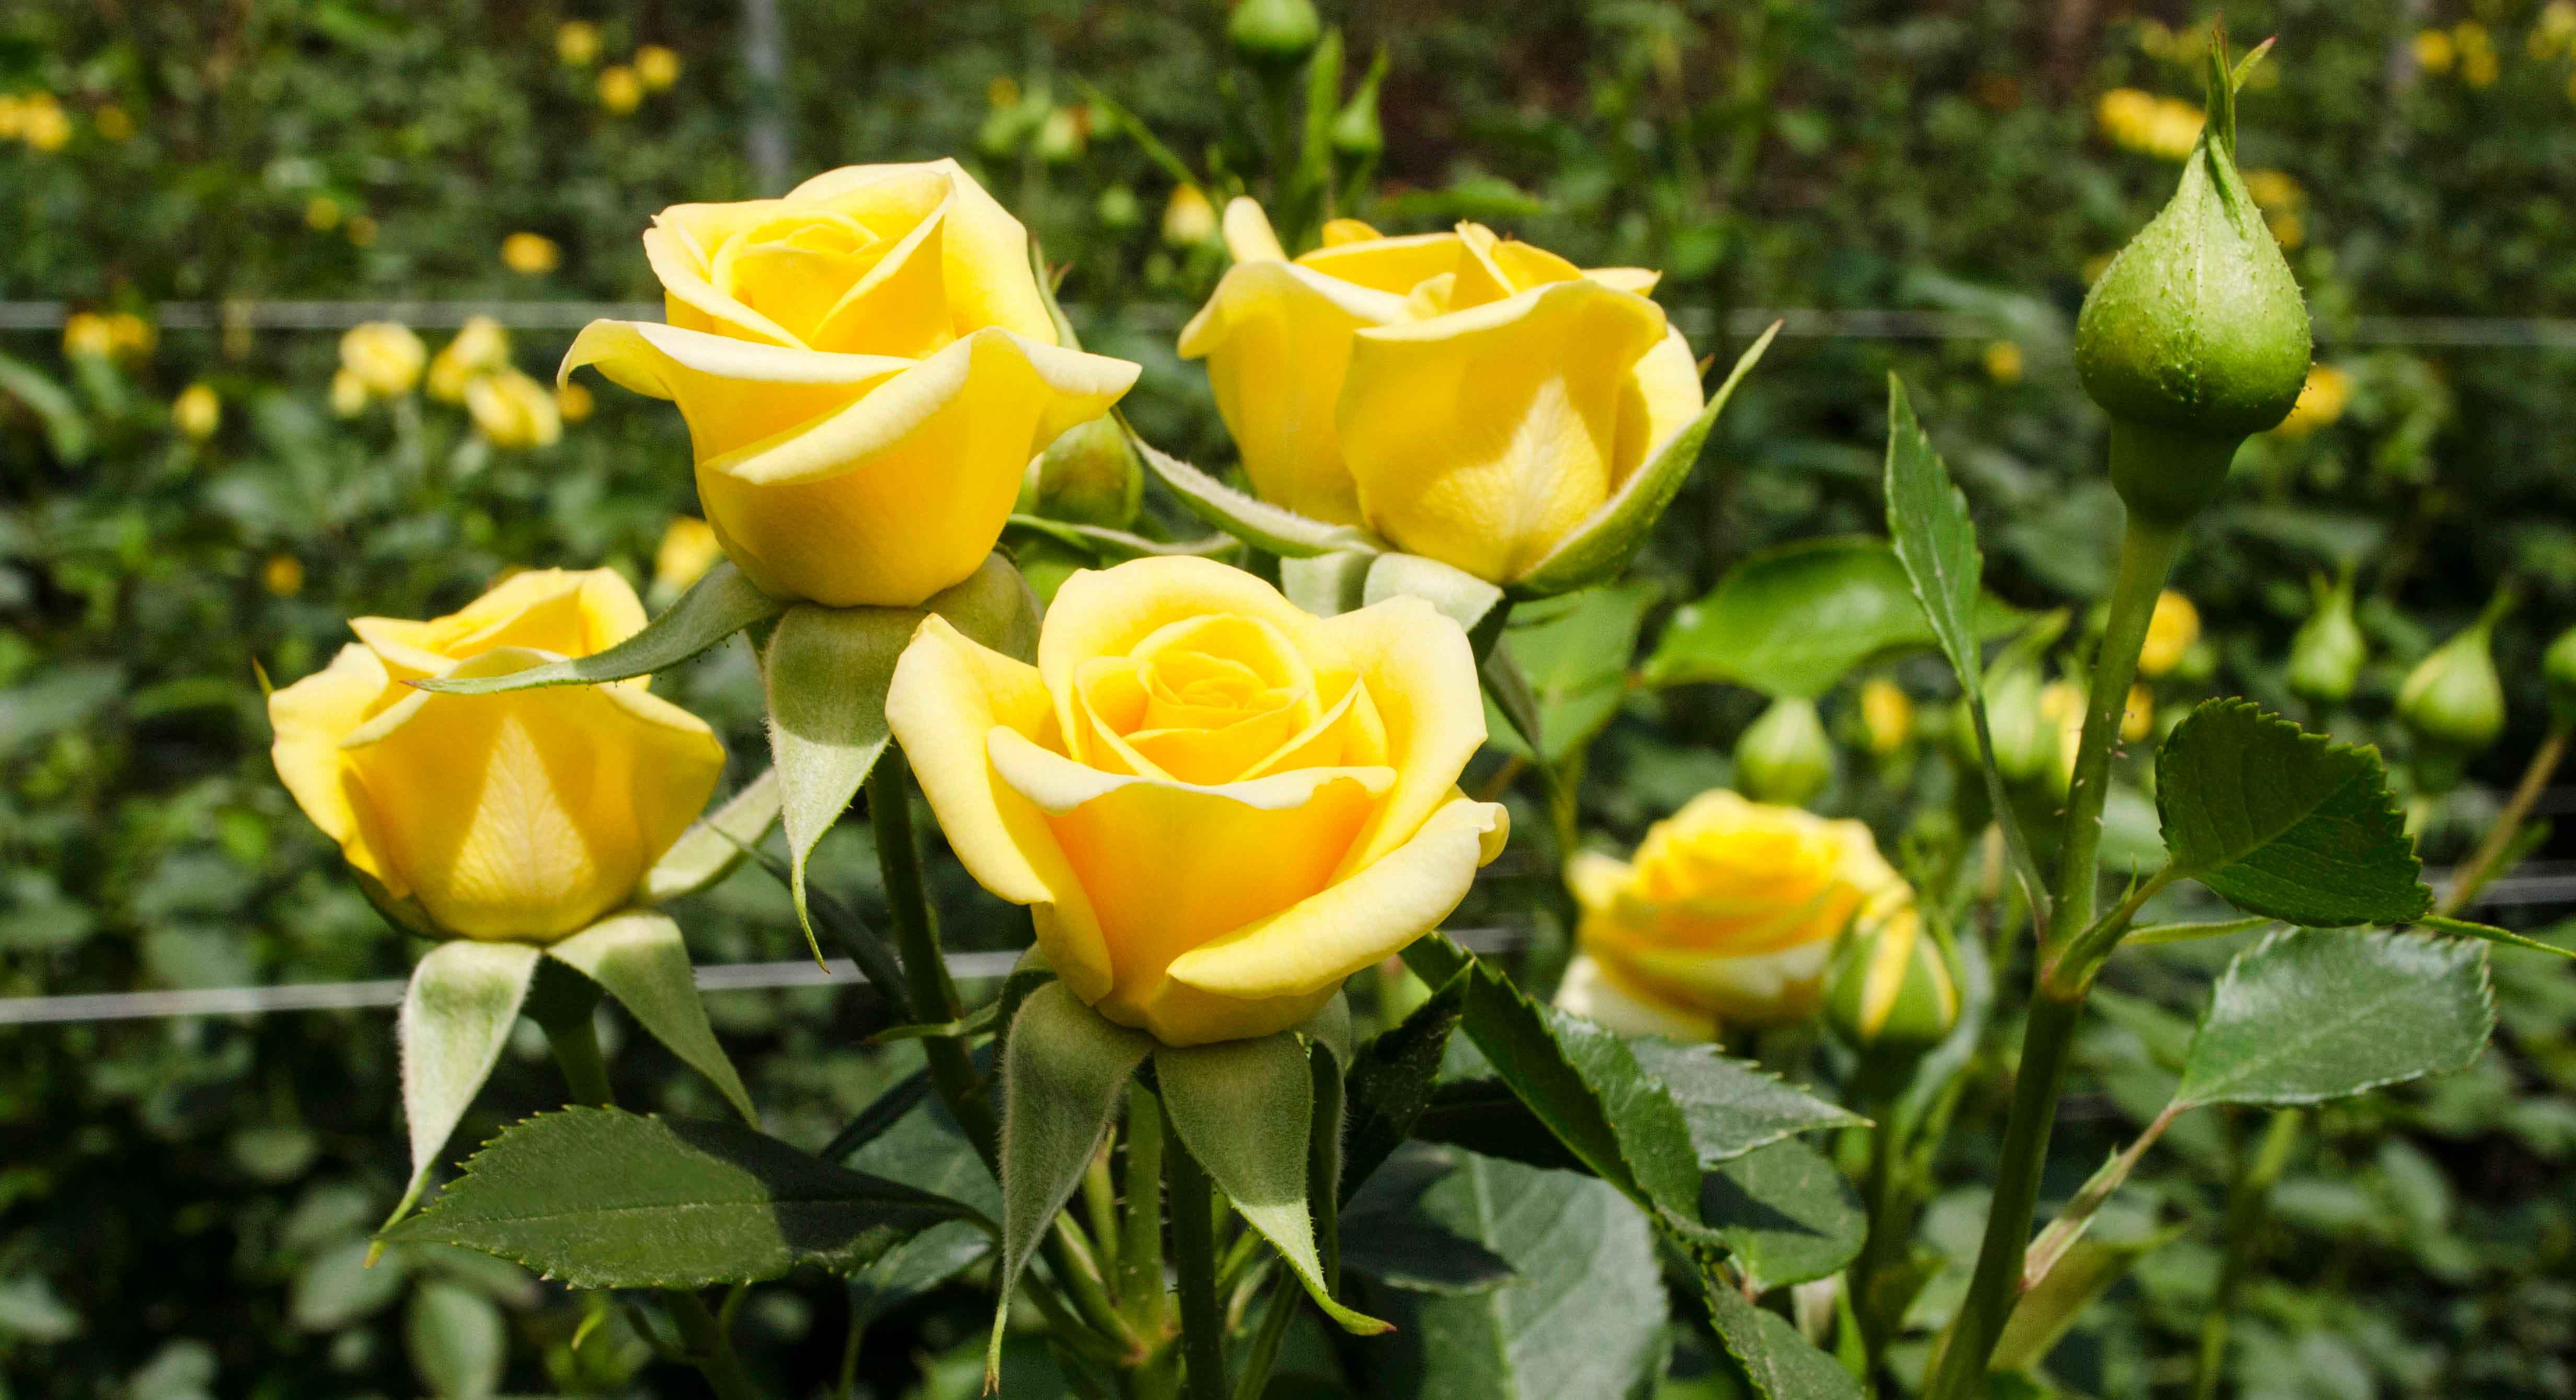 Yelow Rose Ecuador Flowers